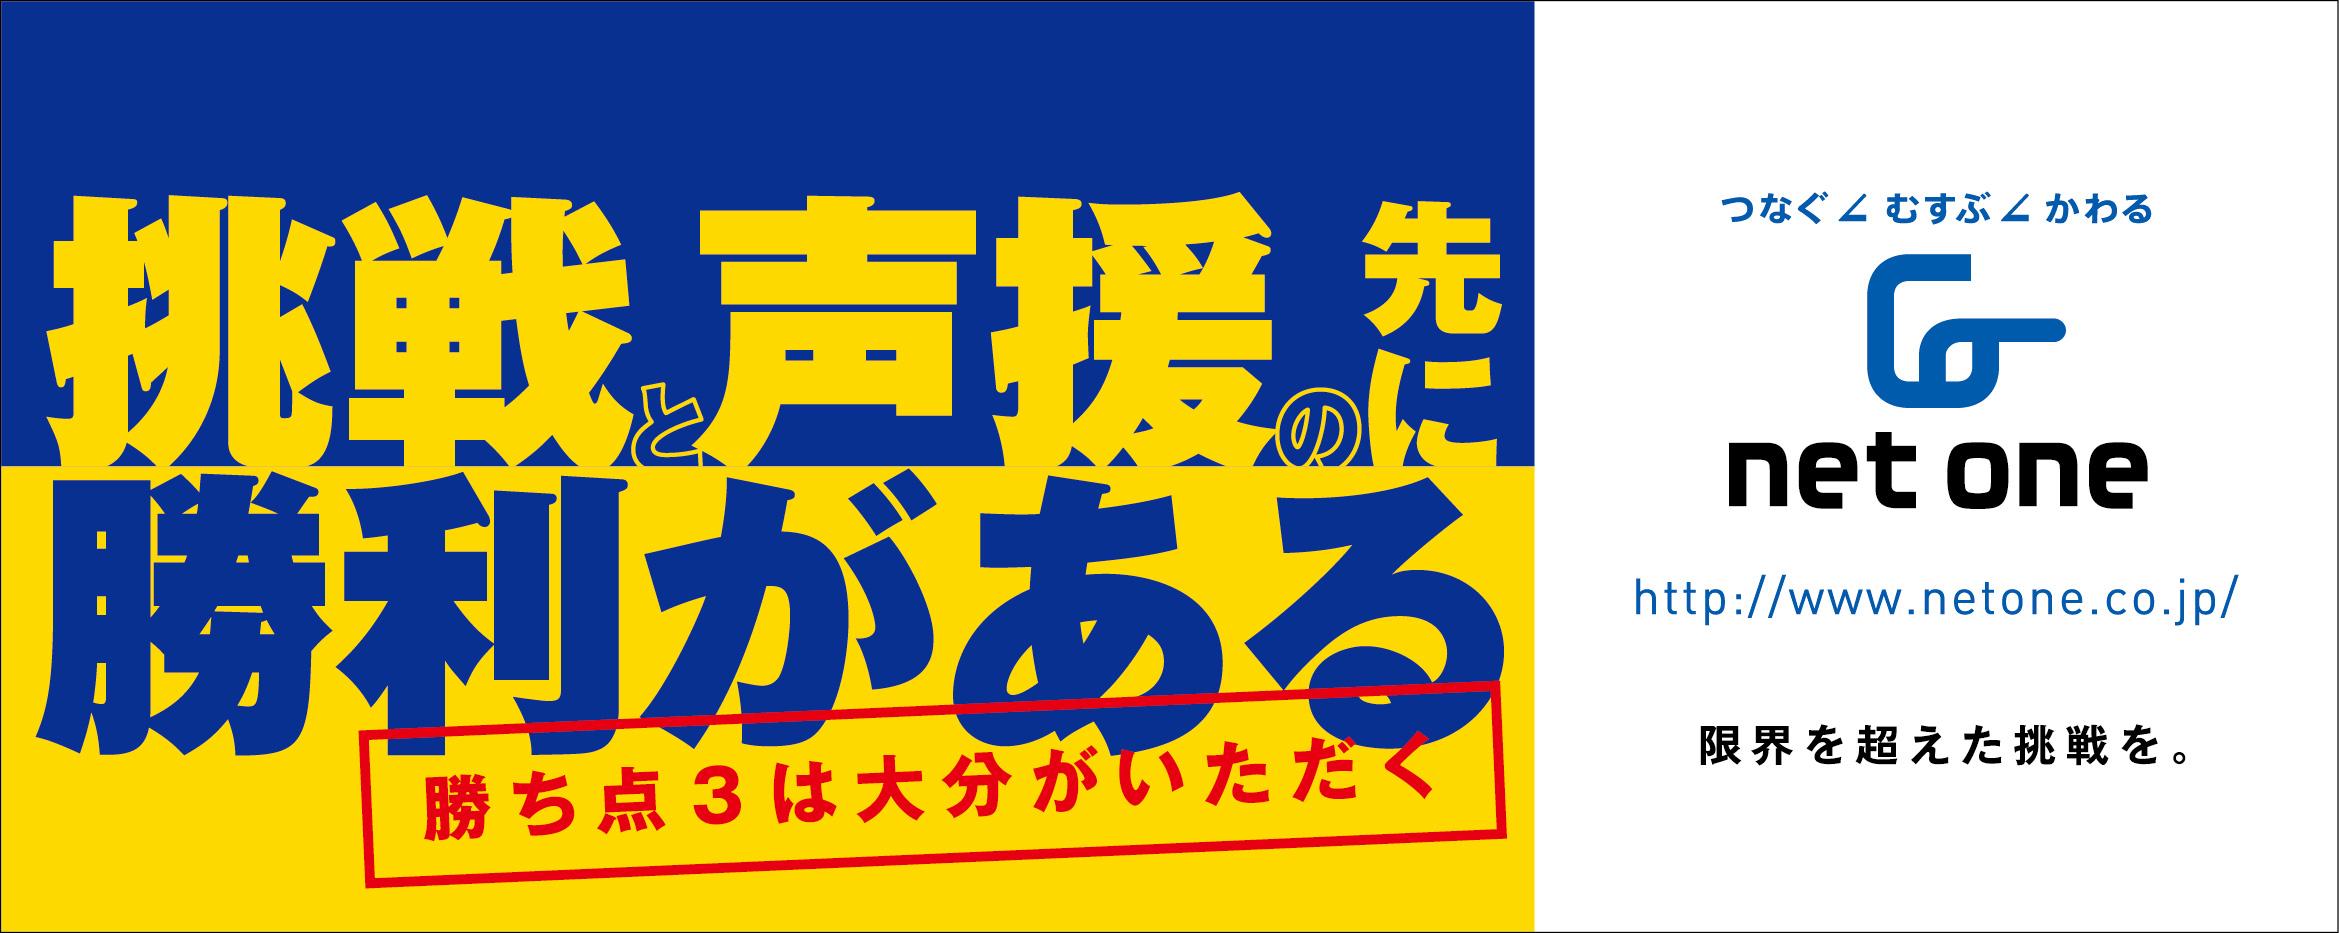 NetOne OITA TRINITA 20151004 第35節 カマタマーレ讃岐戦 広告